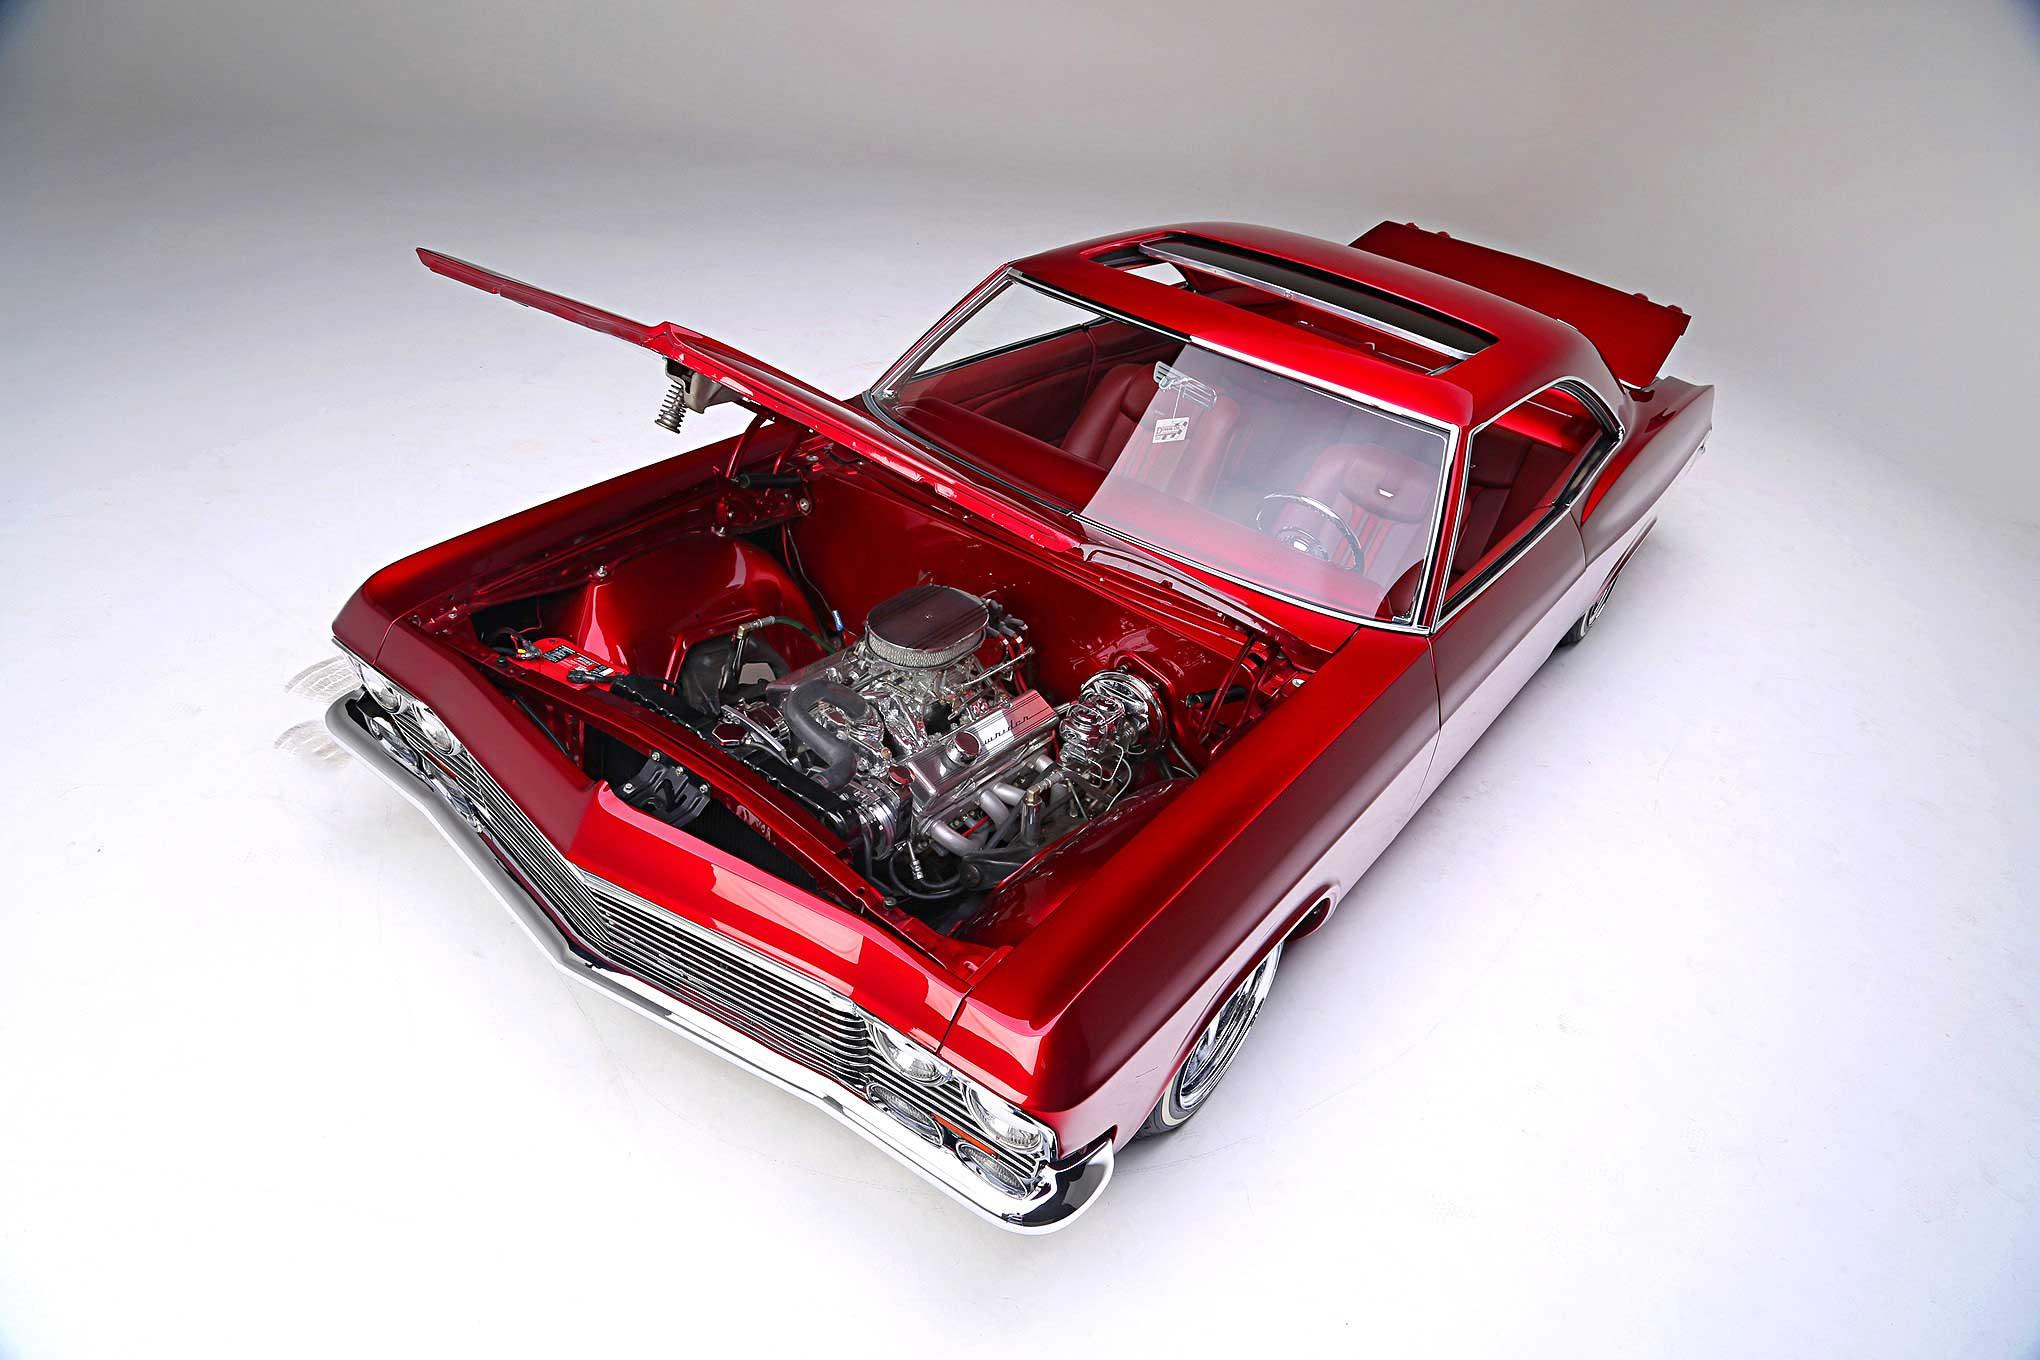 1965 Chevrolet Impala - On a Grander Scale